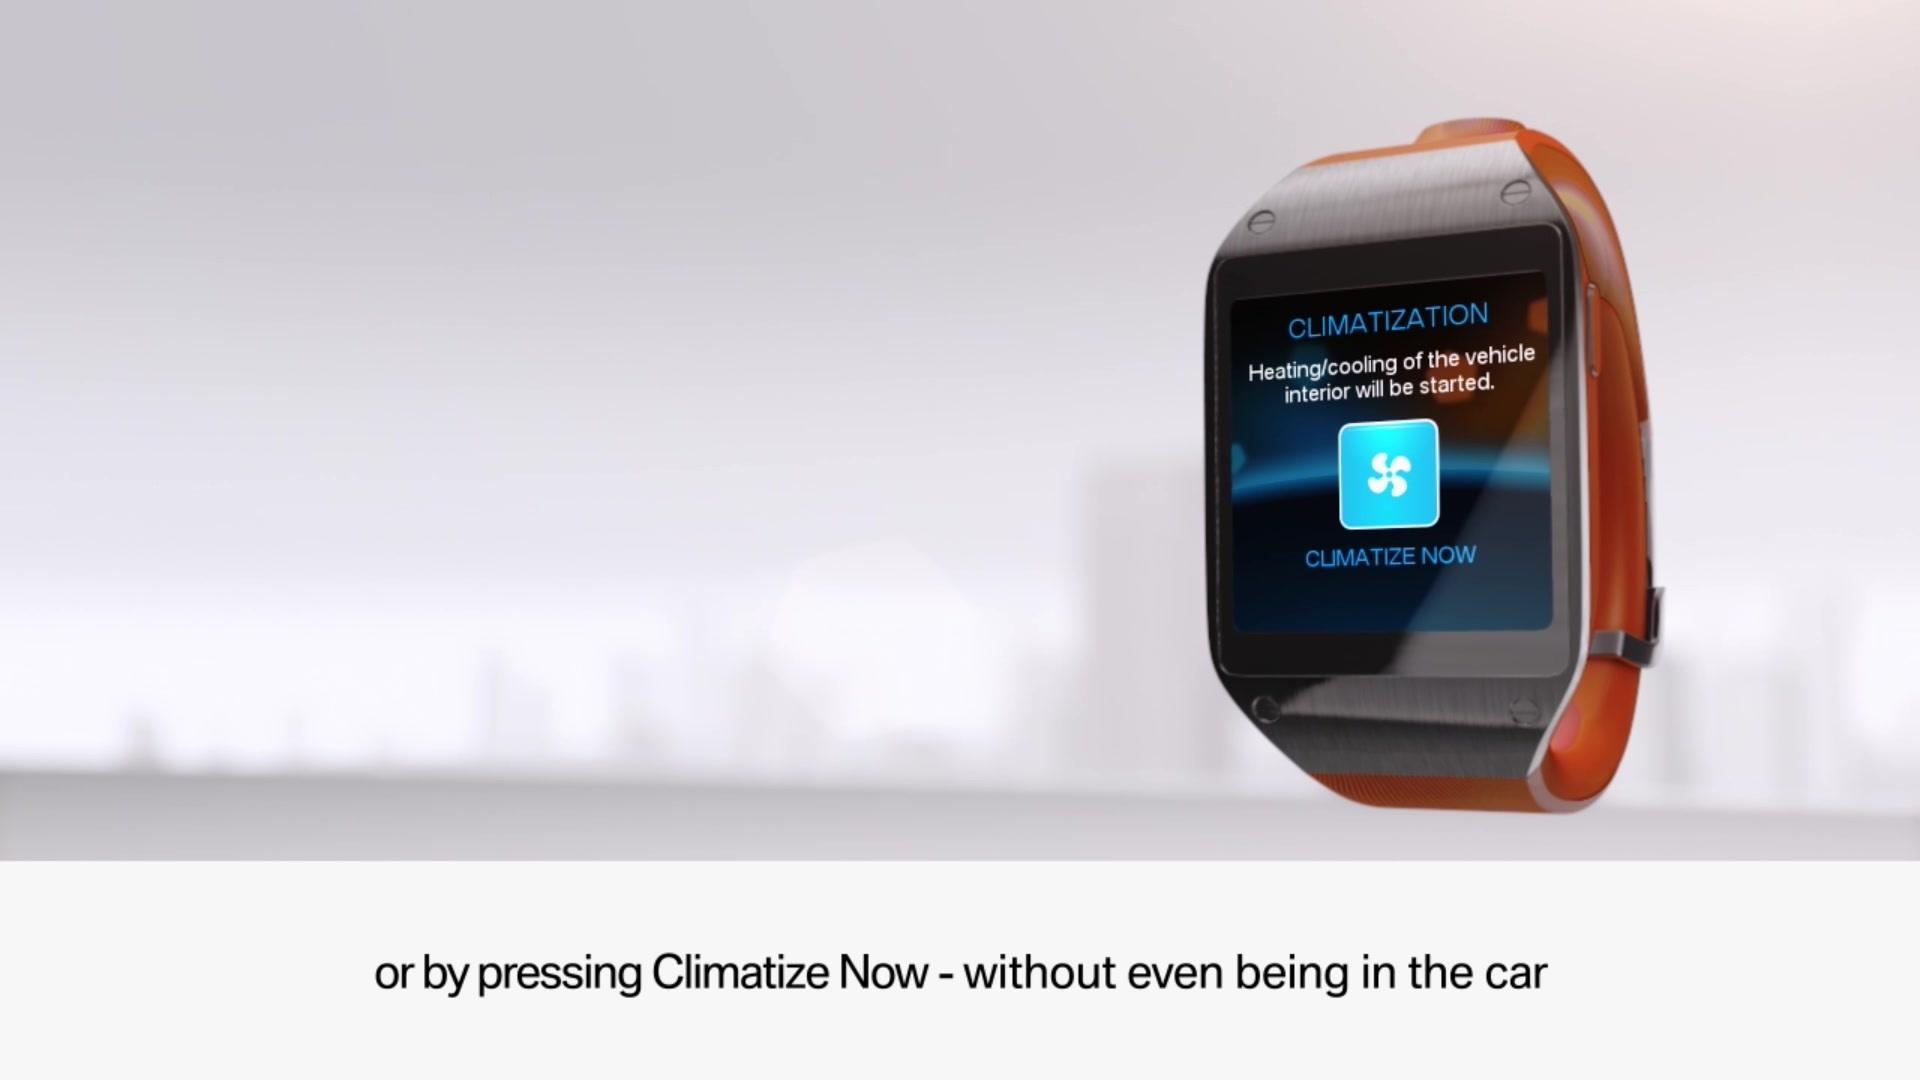 Samsung Galaxy Gear's BMW I3 Remote App Functions Demo